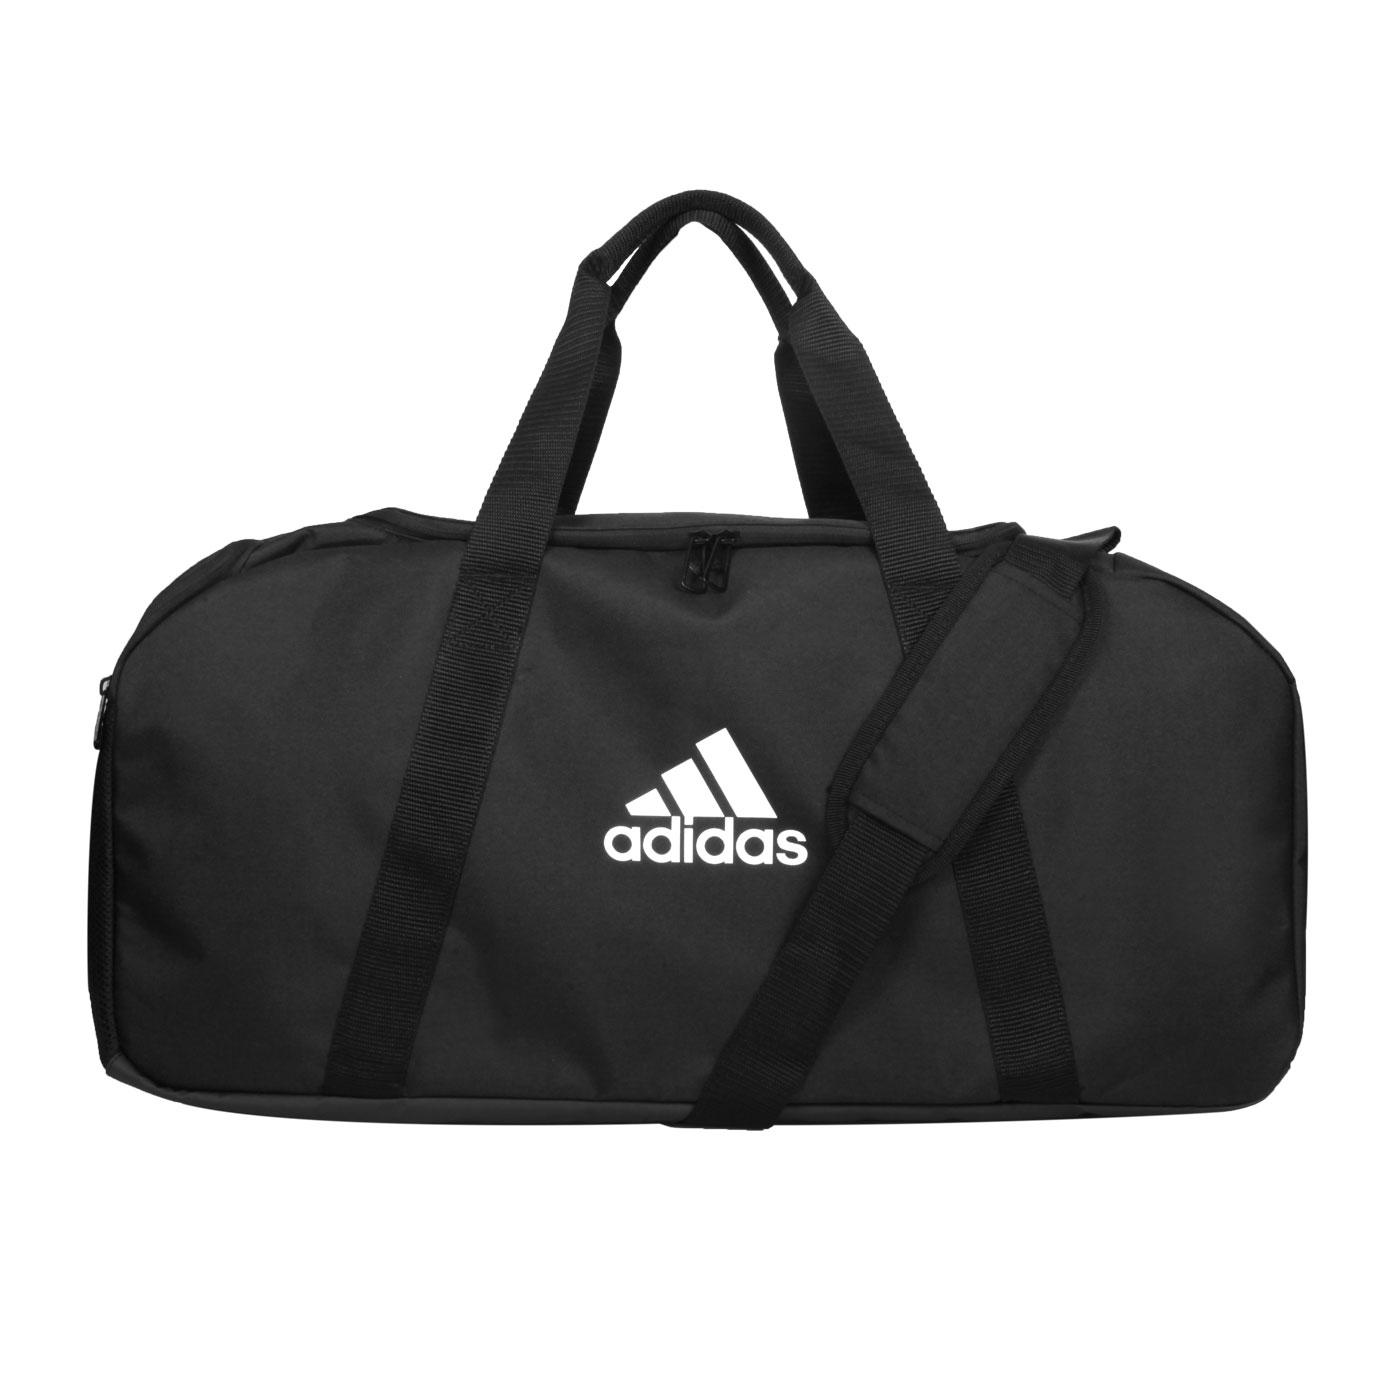 ADIDAS 旅行袋 GH7266 - 黑白